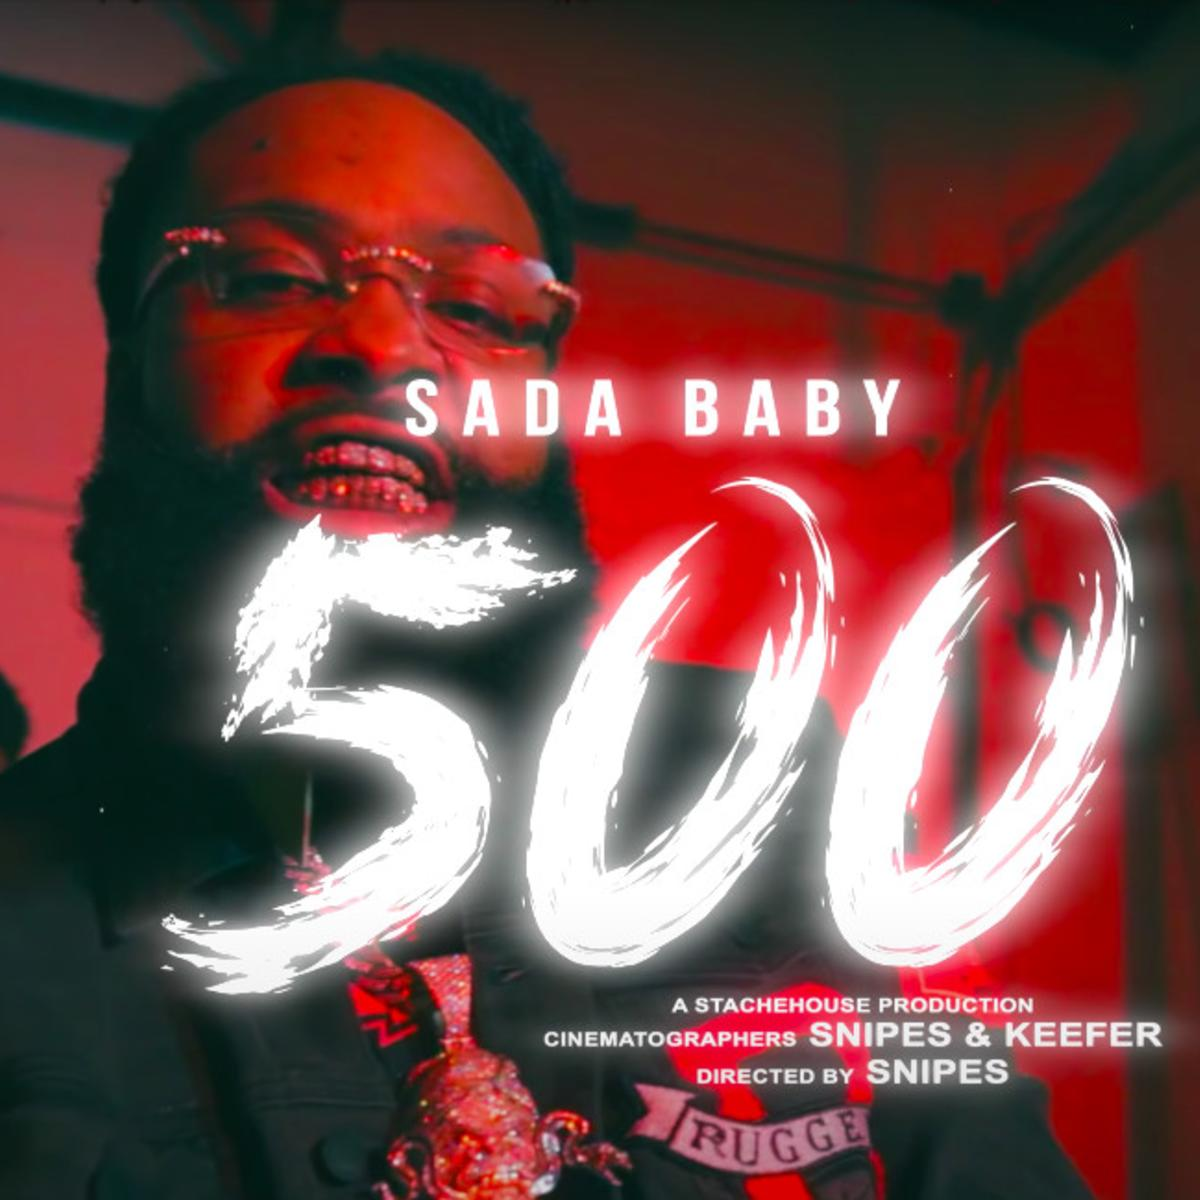 MP3: Sada Baby - 500